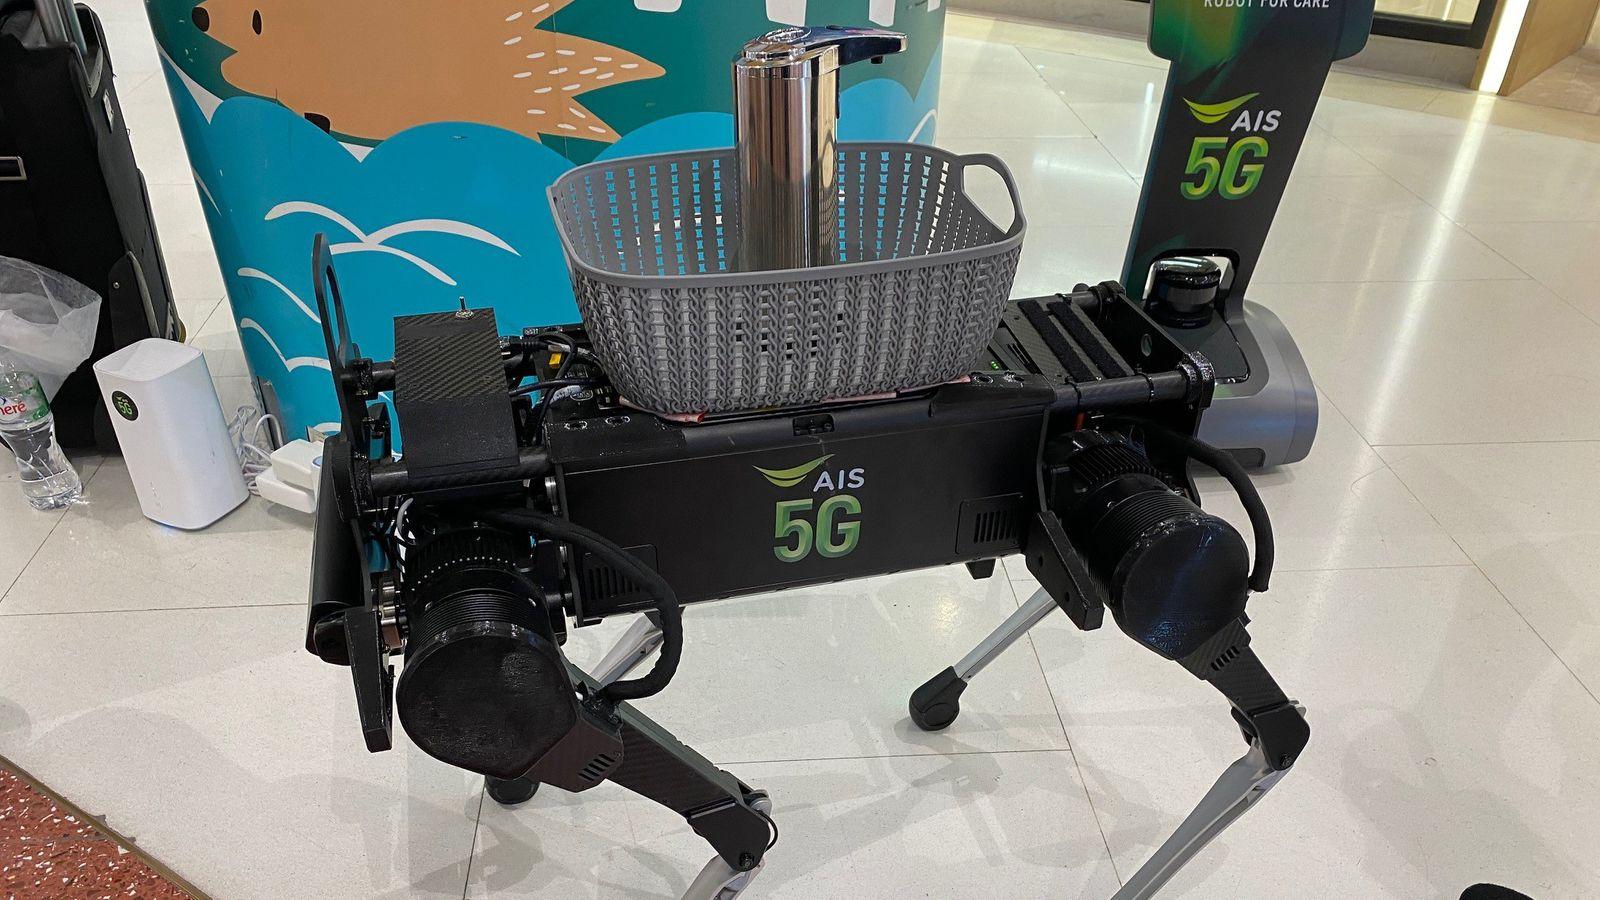 skynews-thailand-robots-k9_4995324